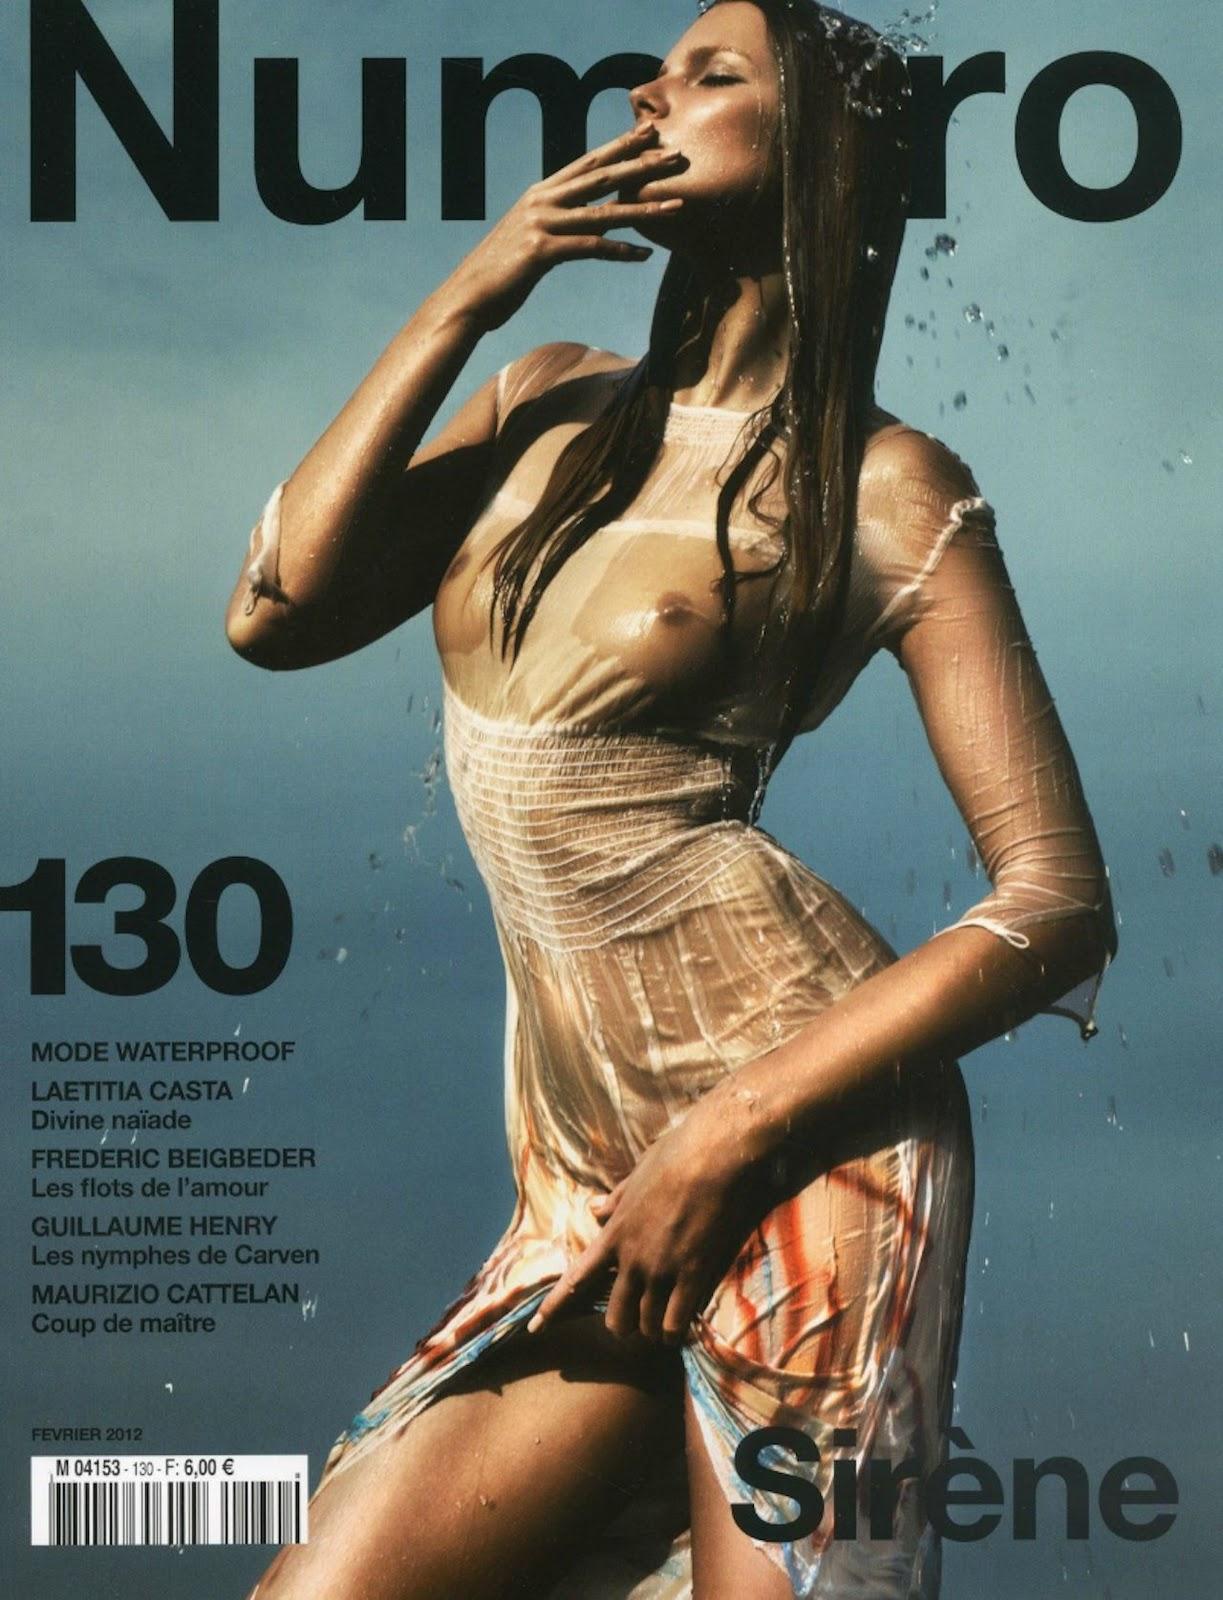 http://1.bp.blogspot.com/-DNWadc_G01I/TywT0aFztoI/AAAAAAAAtJs/GhK6OSIE0KQ/s1600/eniko+mihalik+sofia+sanchez+&+mauro+mongiello+nume%CC%81ro+%23130,+february+2012+cover.jpg